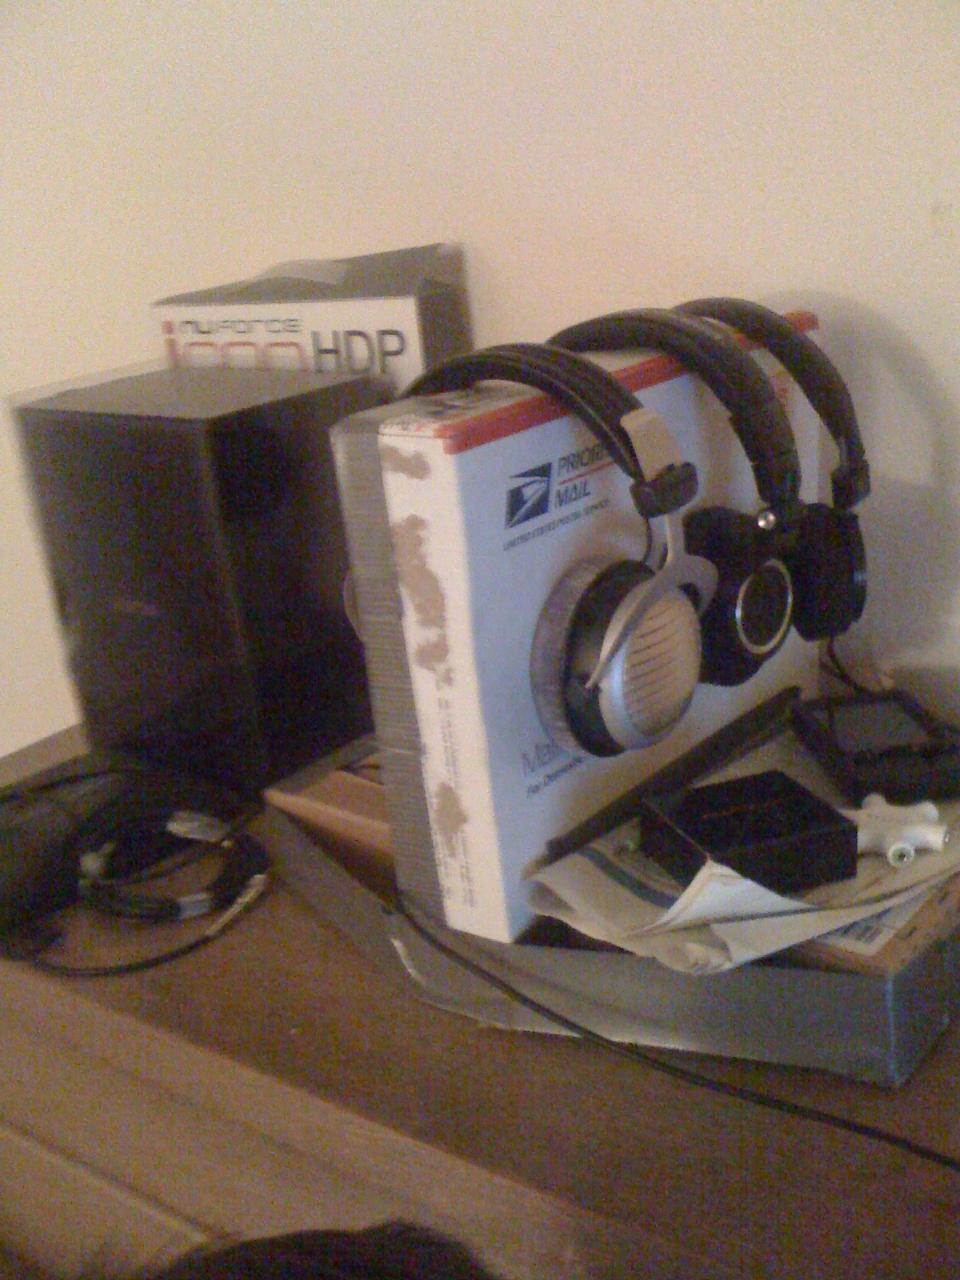 headphonestation.JPG